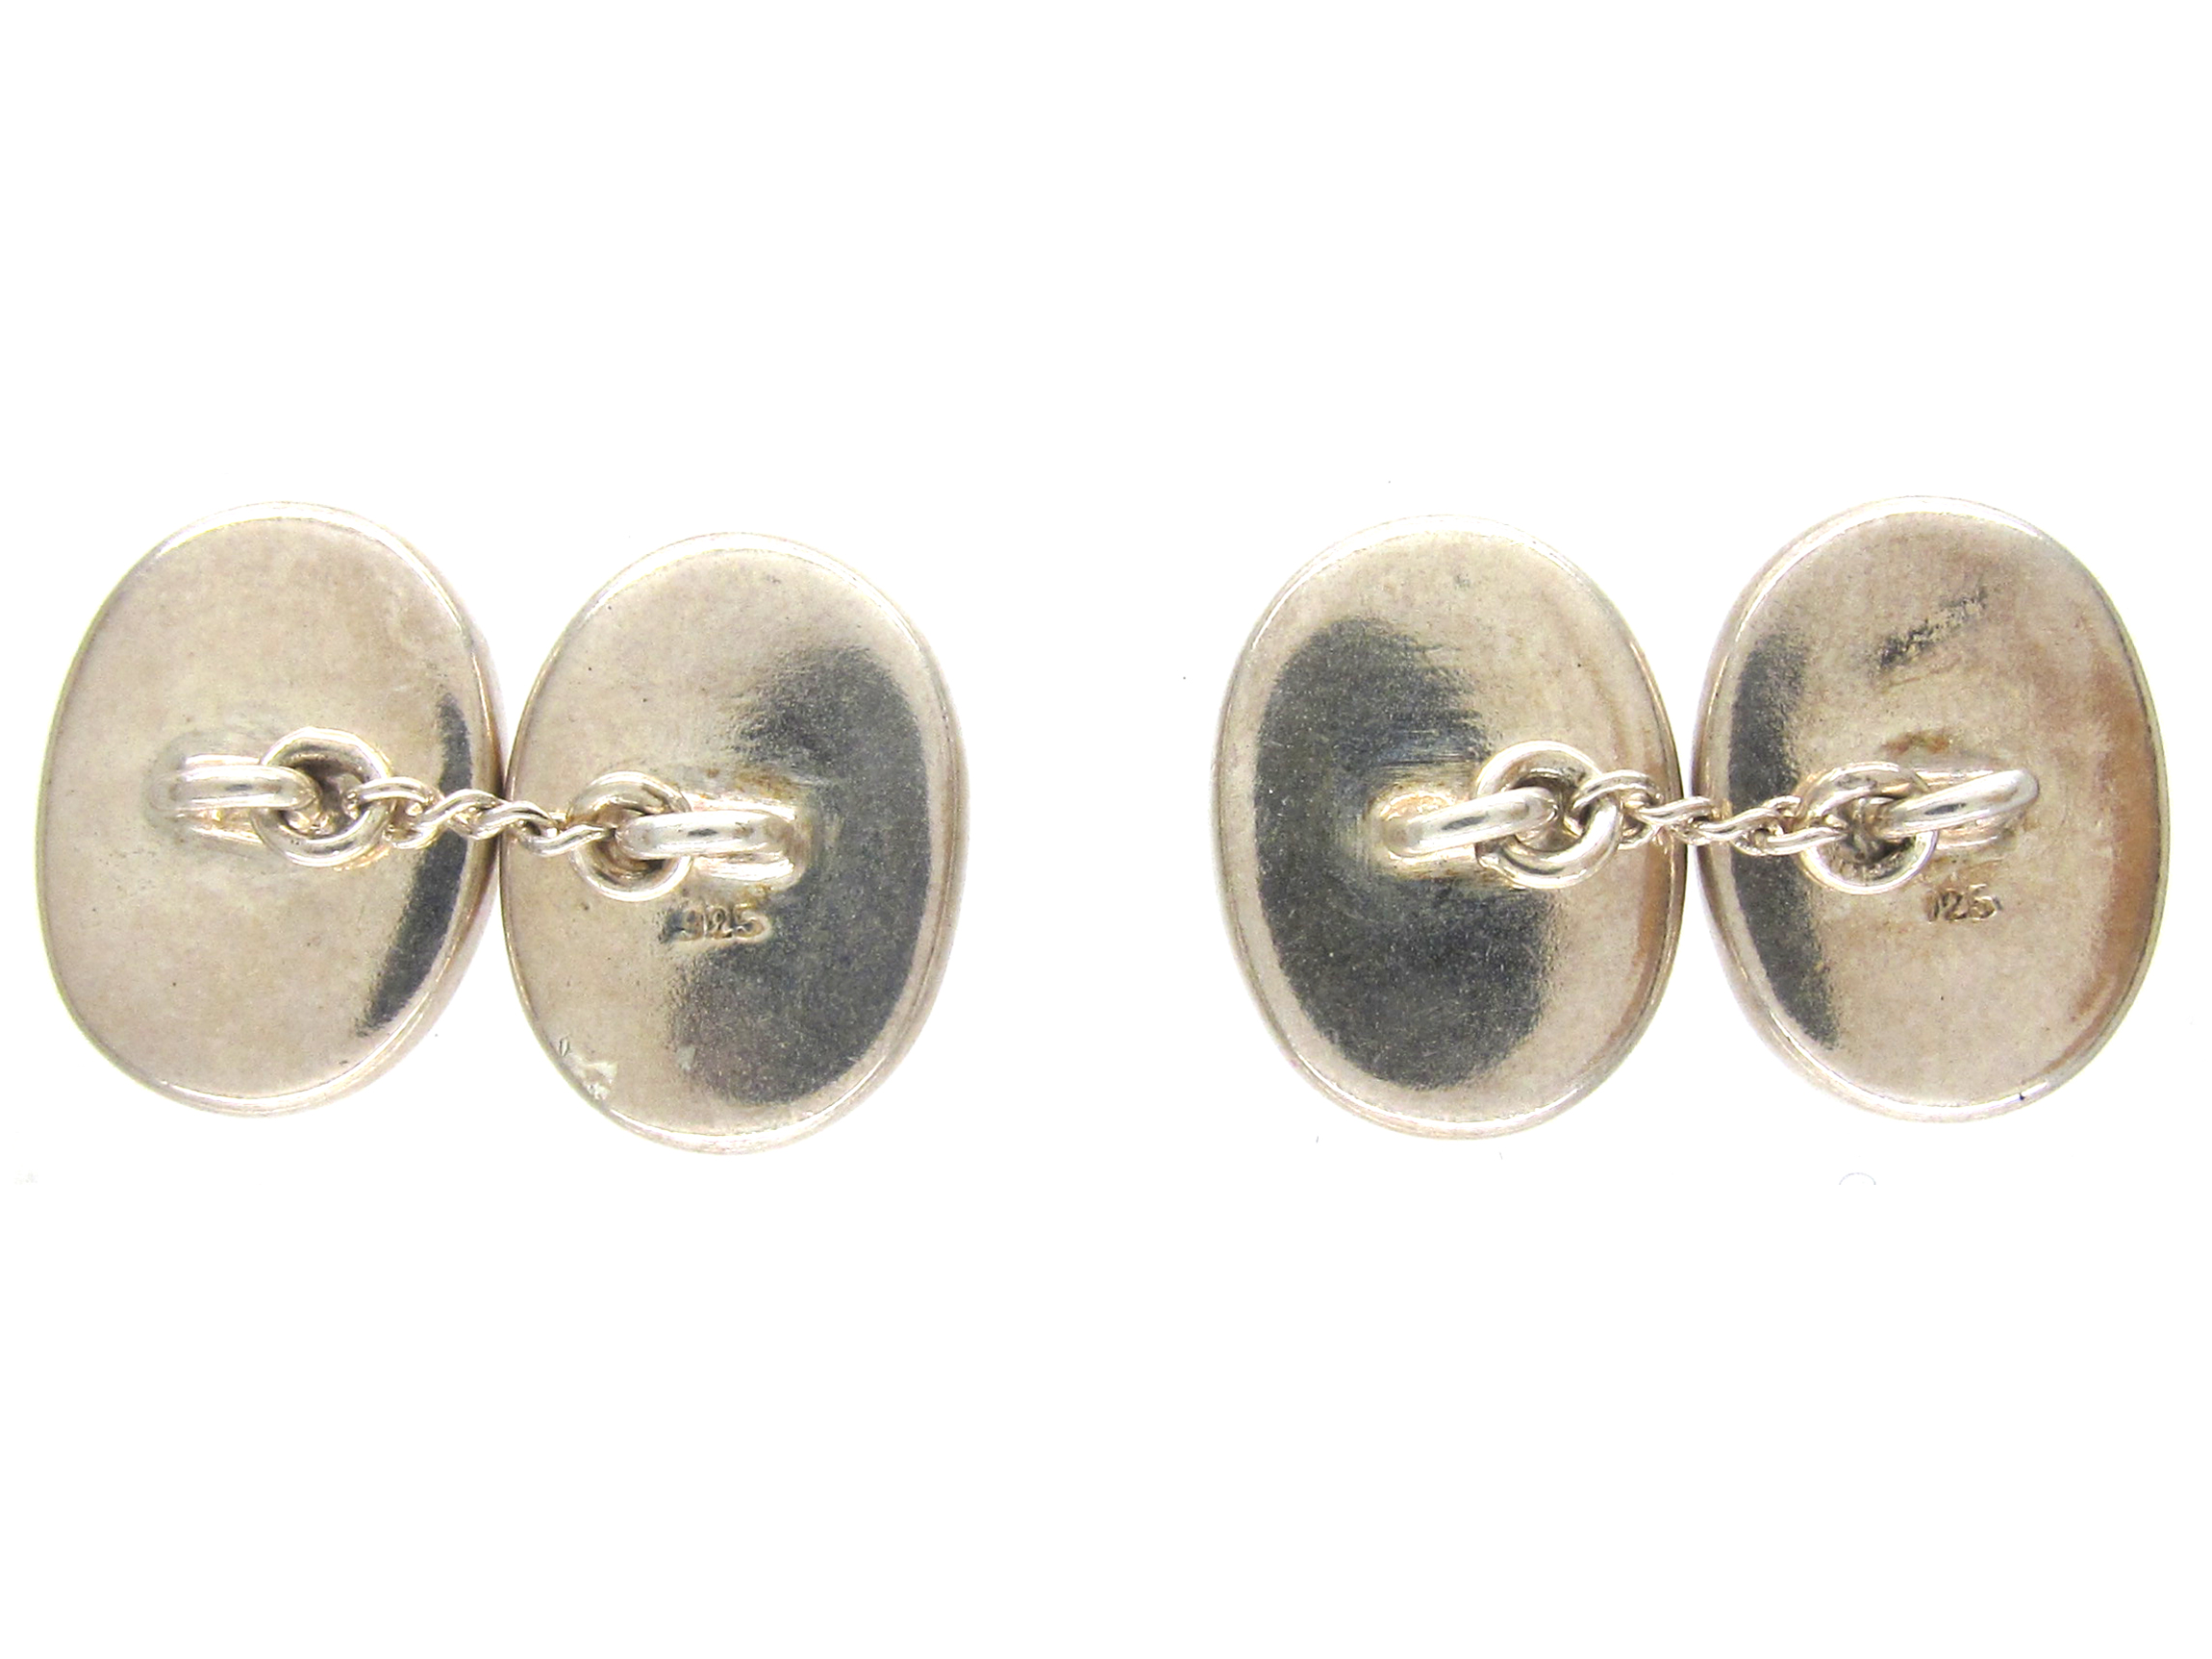 Silver & Porcelain Four Vices Cufflinks